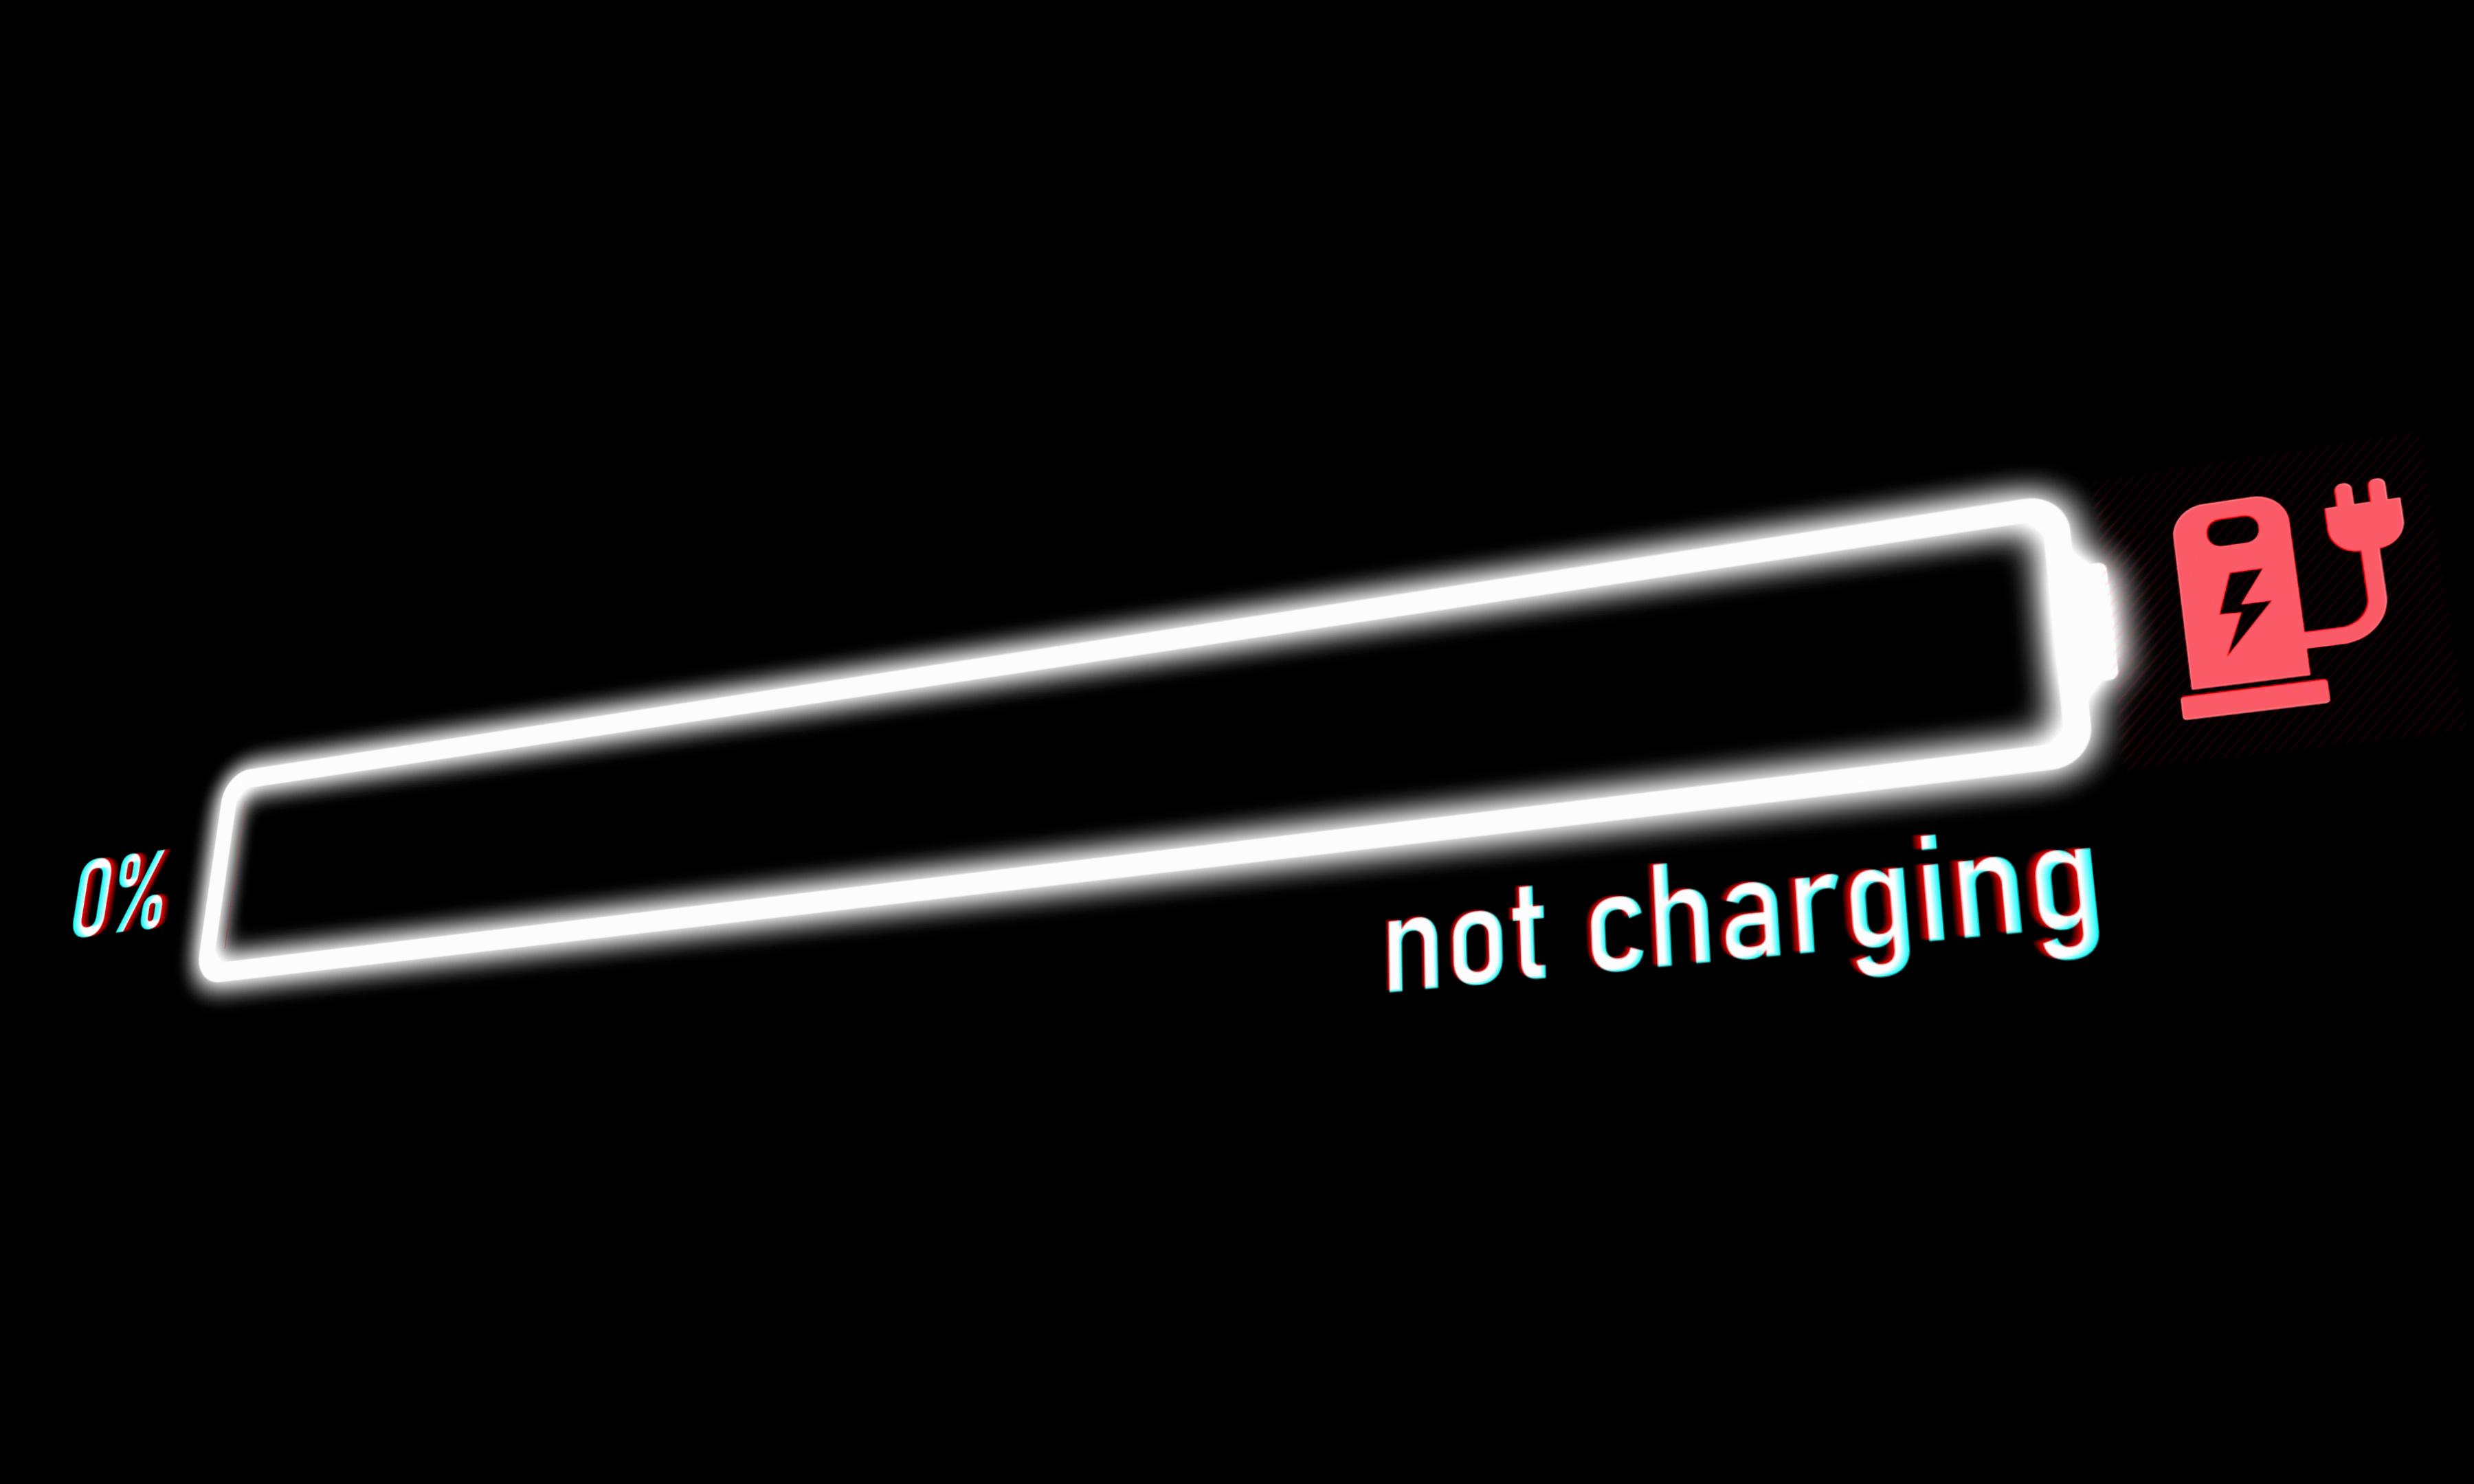 istock画像 バッテリー残量